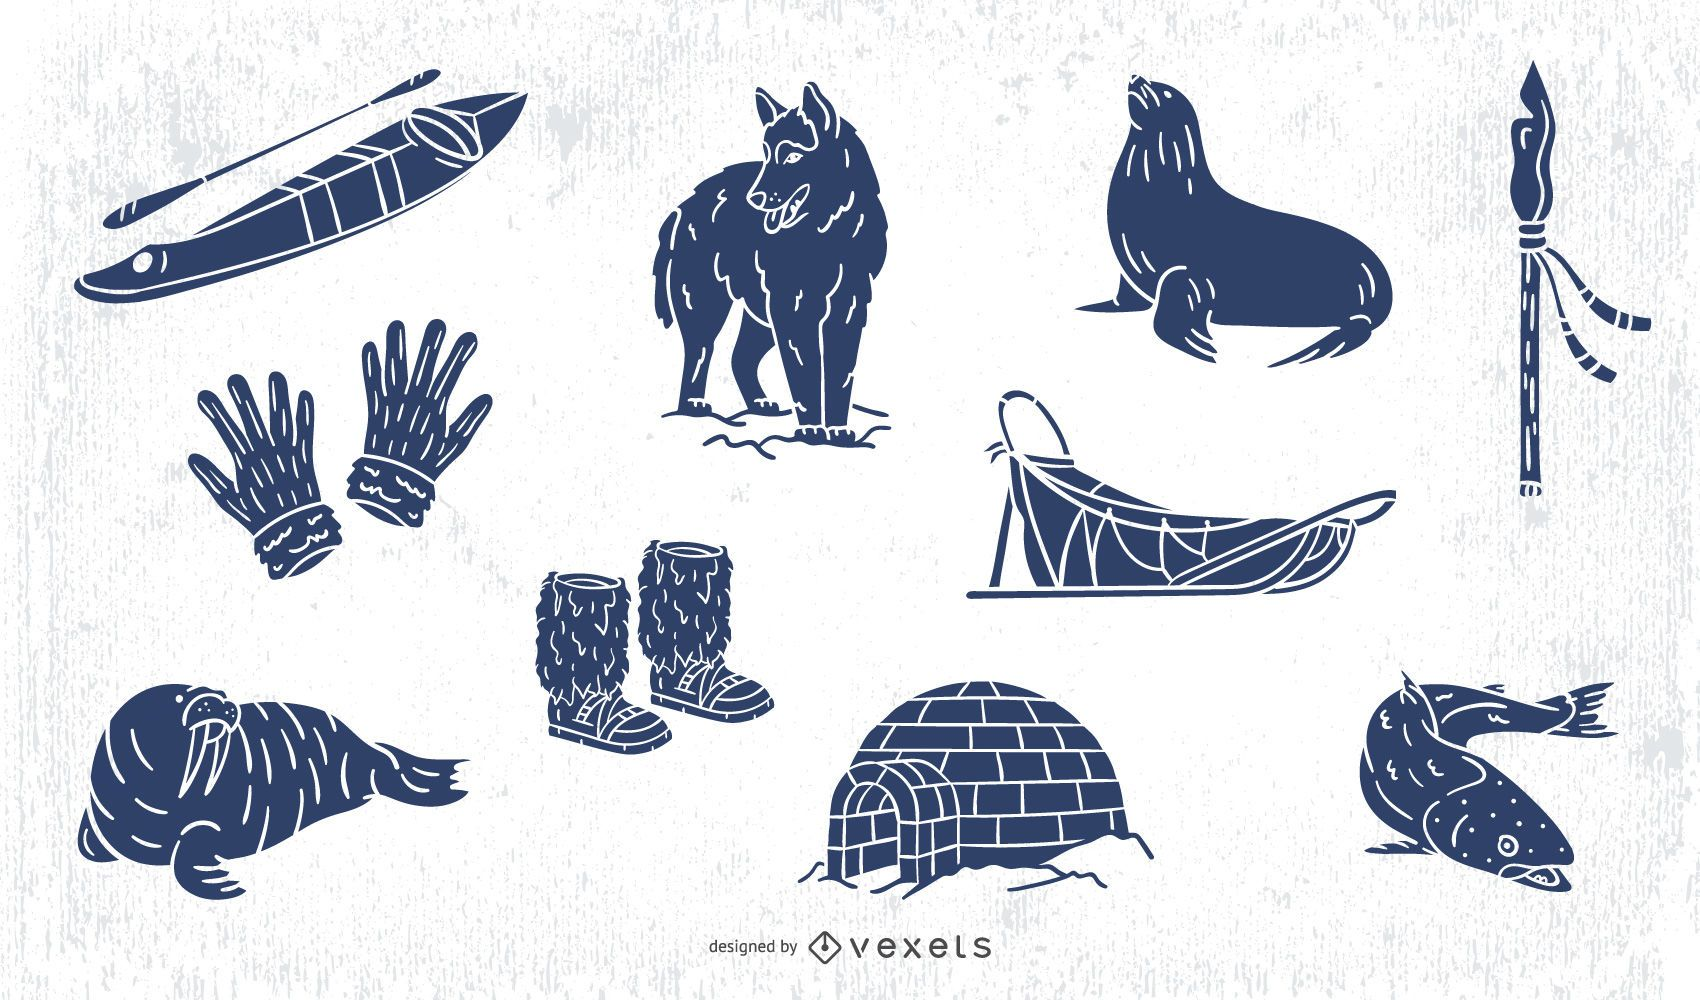 Eskimo hand drawn elements pack